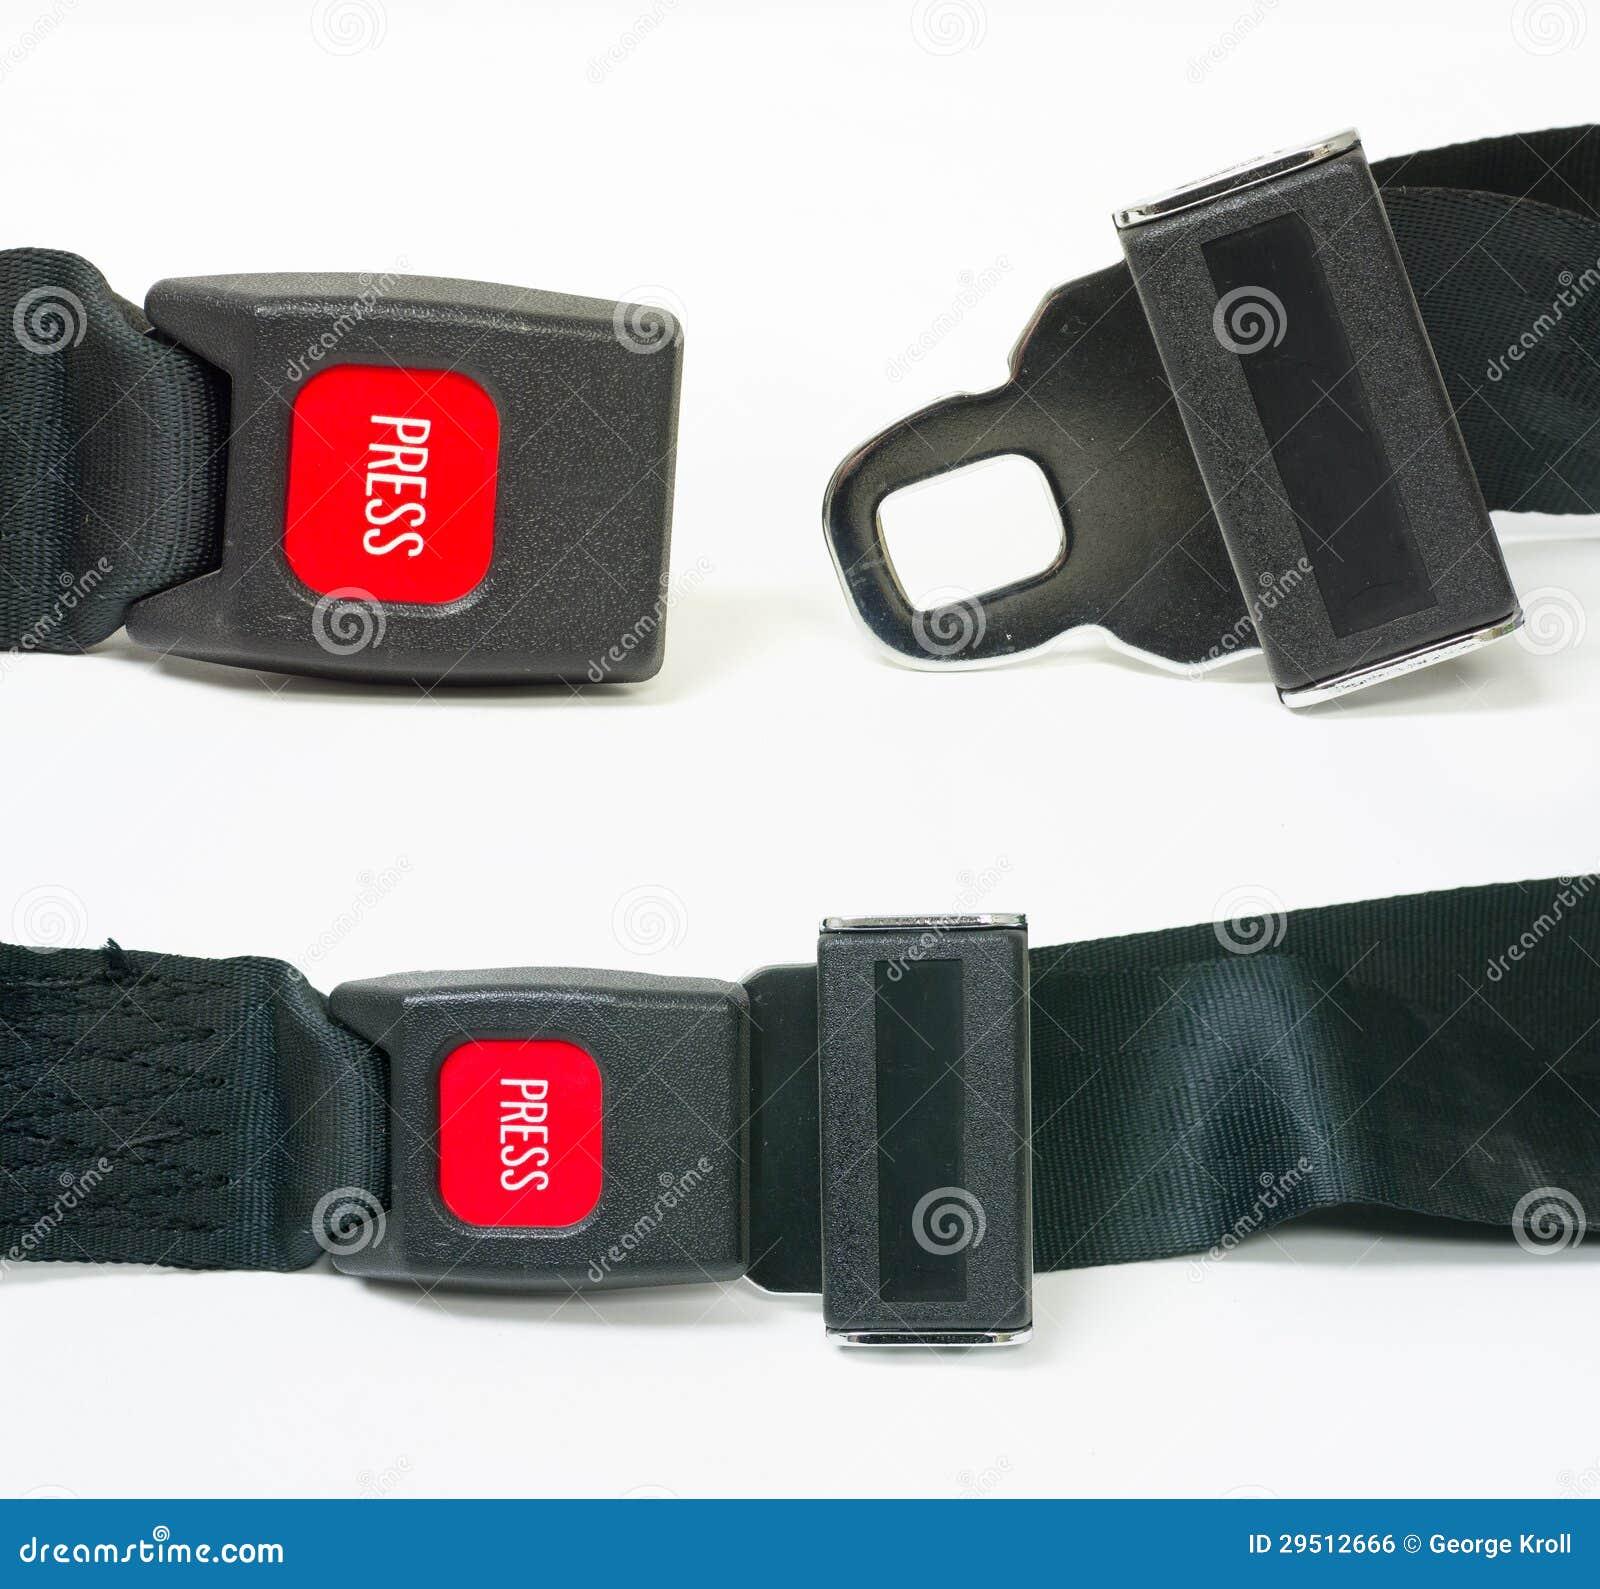 how to clean seat belt sensor